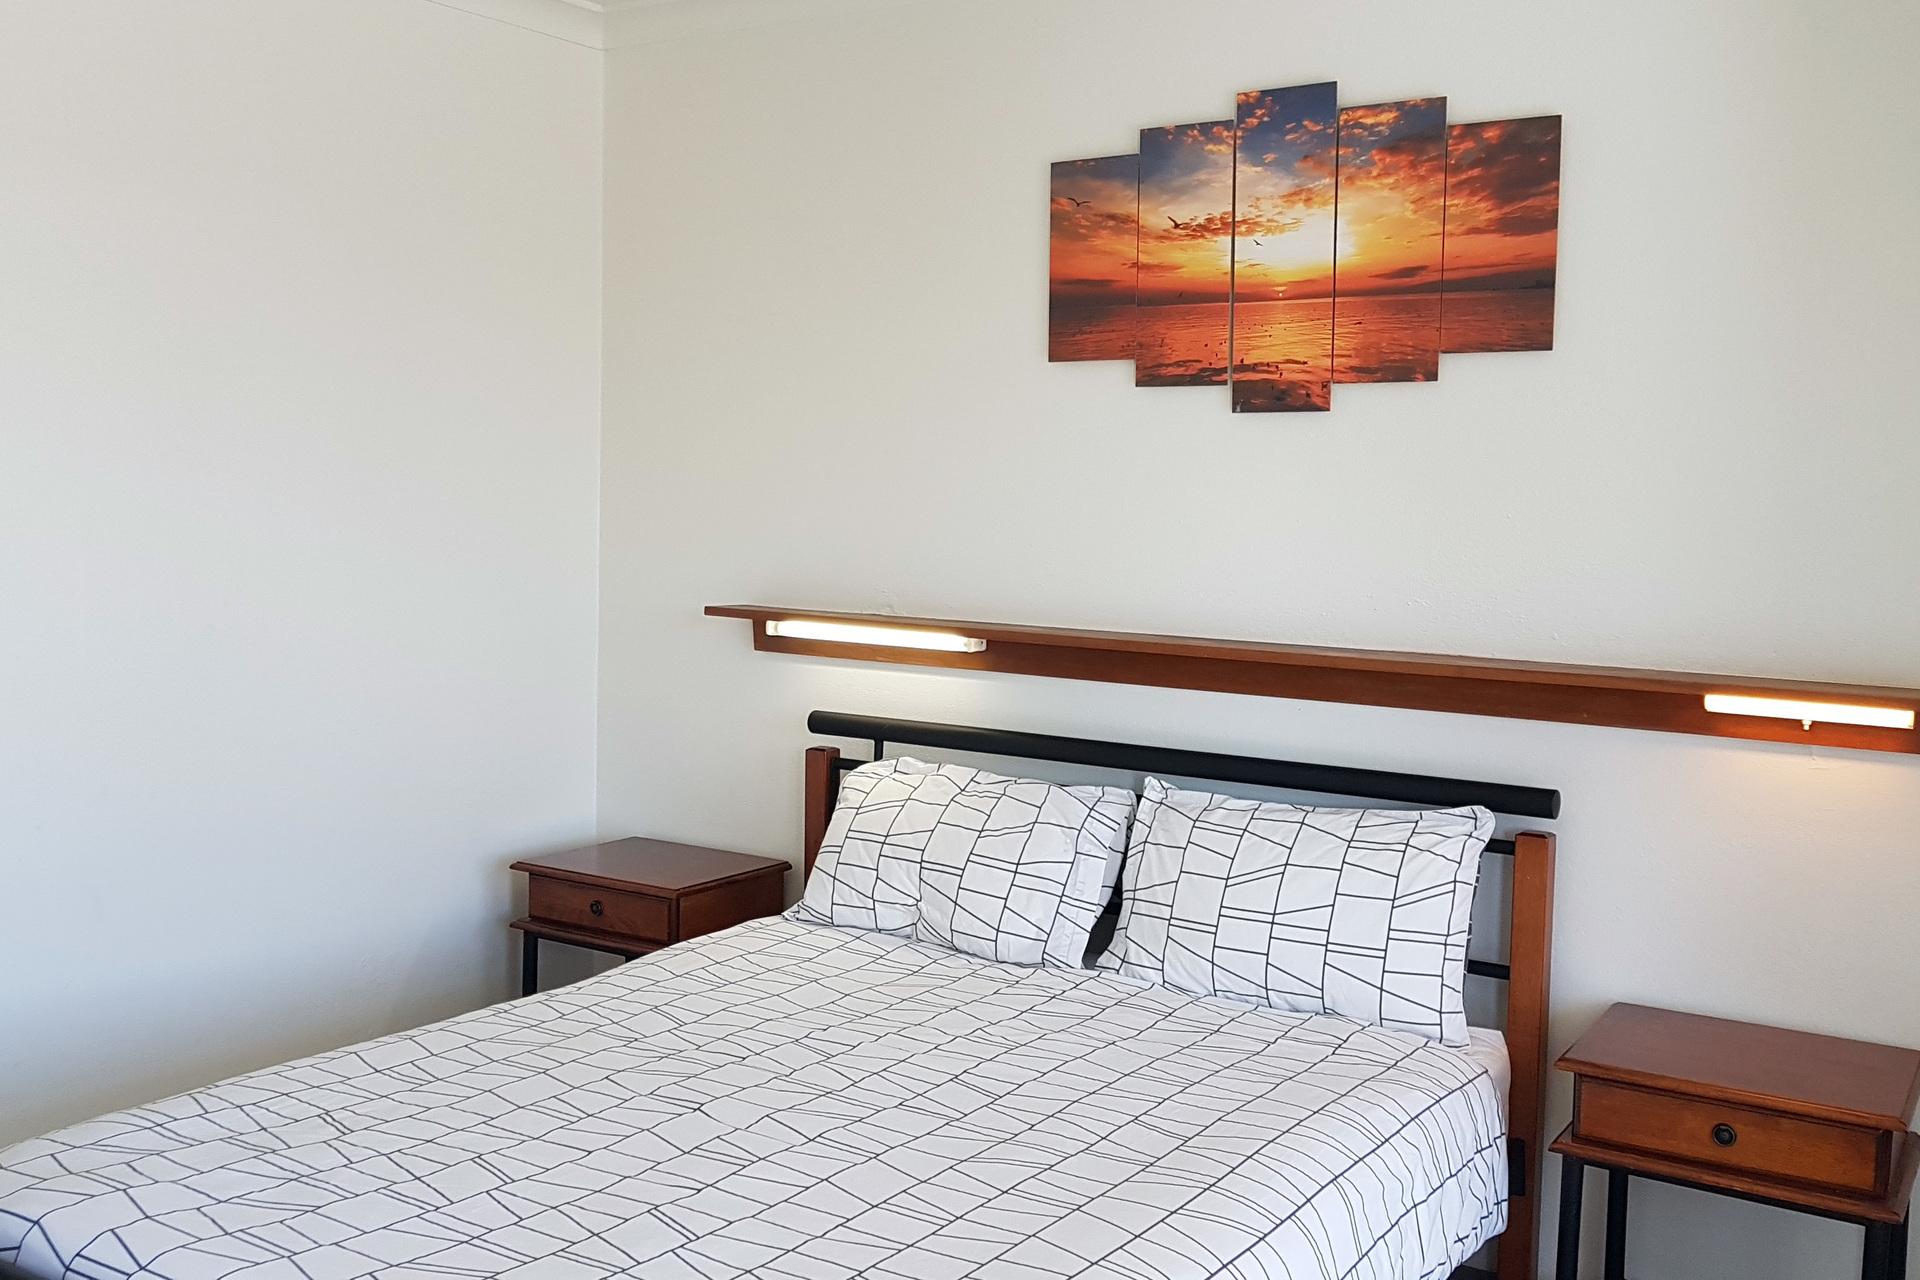 e - Coolgardie Gold Rush Motels